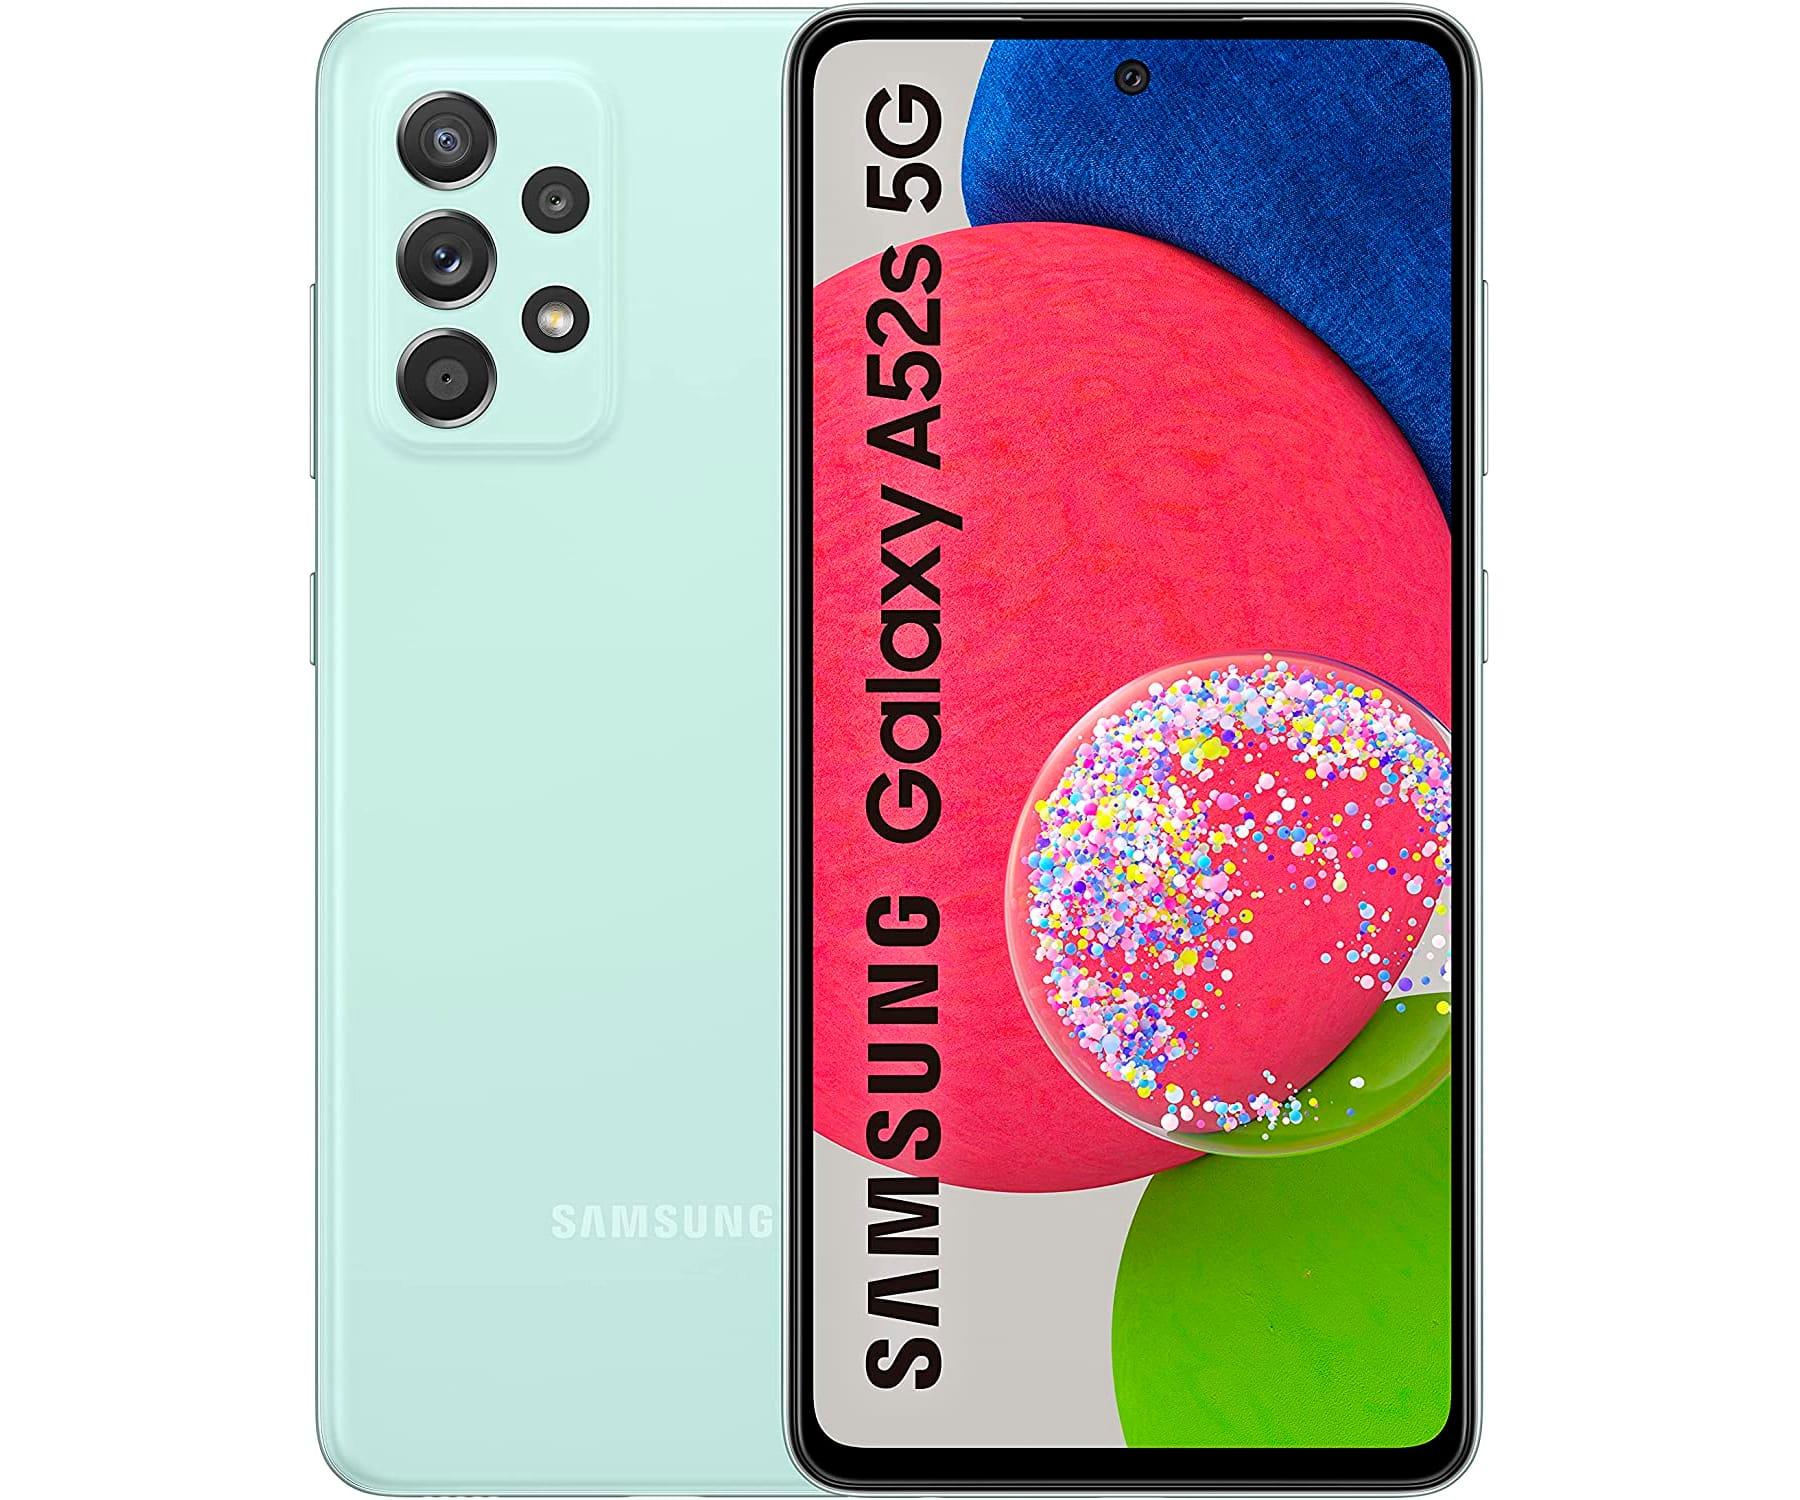 "SAMSUNG GALAXY A52S 5G VERDE (LIGHT GREEN) 6+128GB / 6.5"" AMOLED / DUAL SIM"